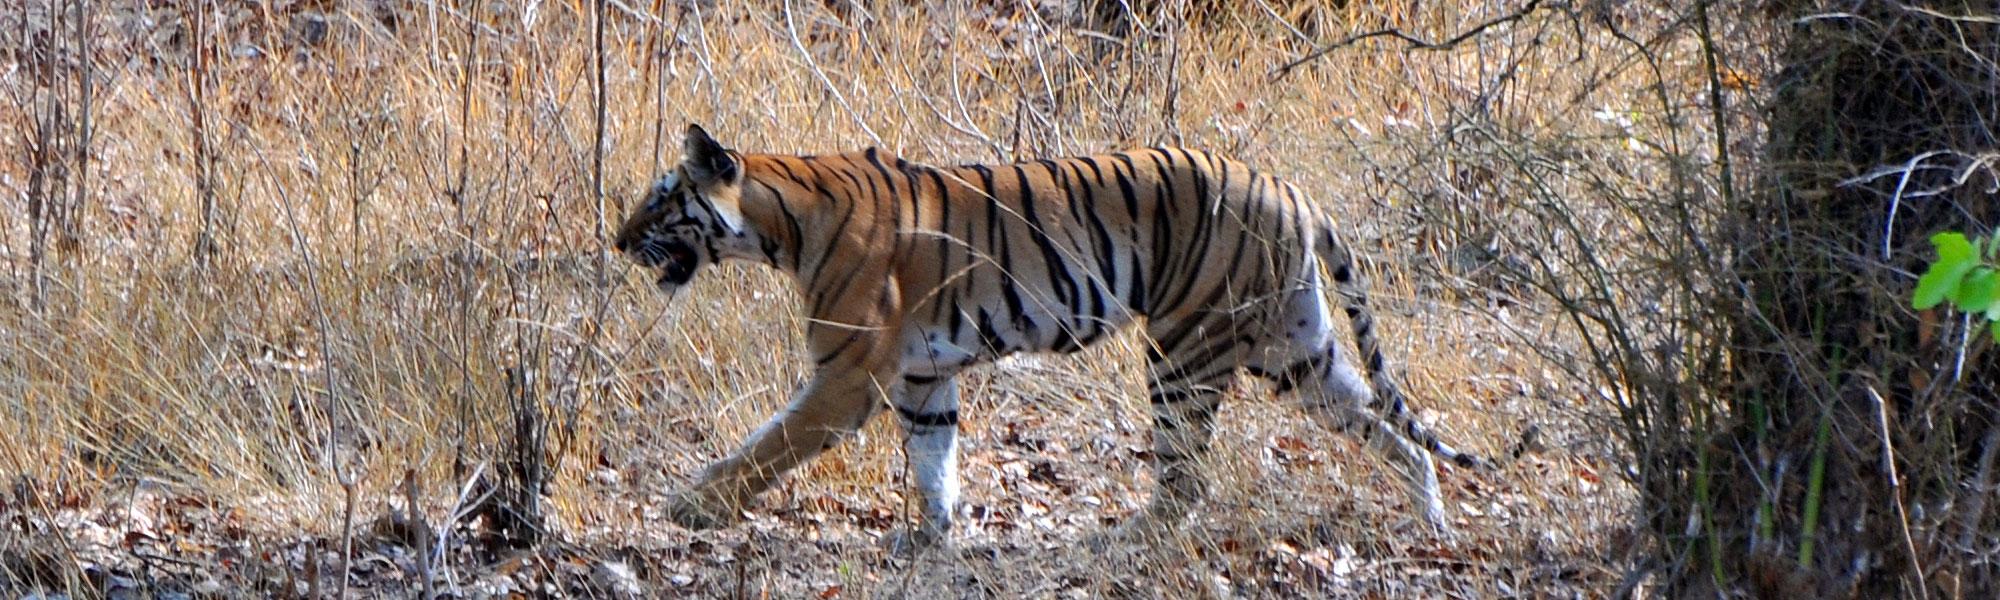 Bandhavgarh India  city photos : Bandhavgarh National Park, India Bandhavgarh is blessed with over ...